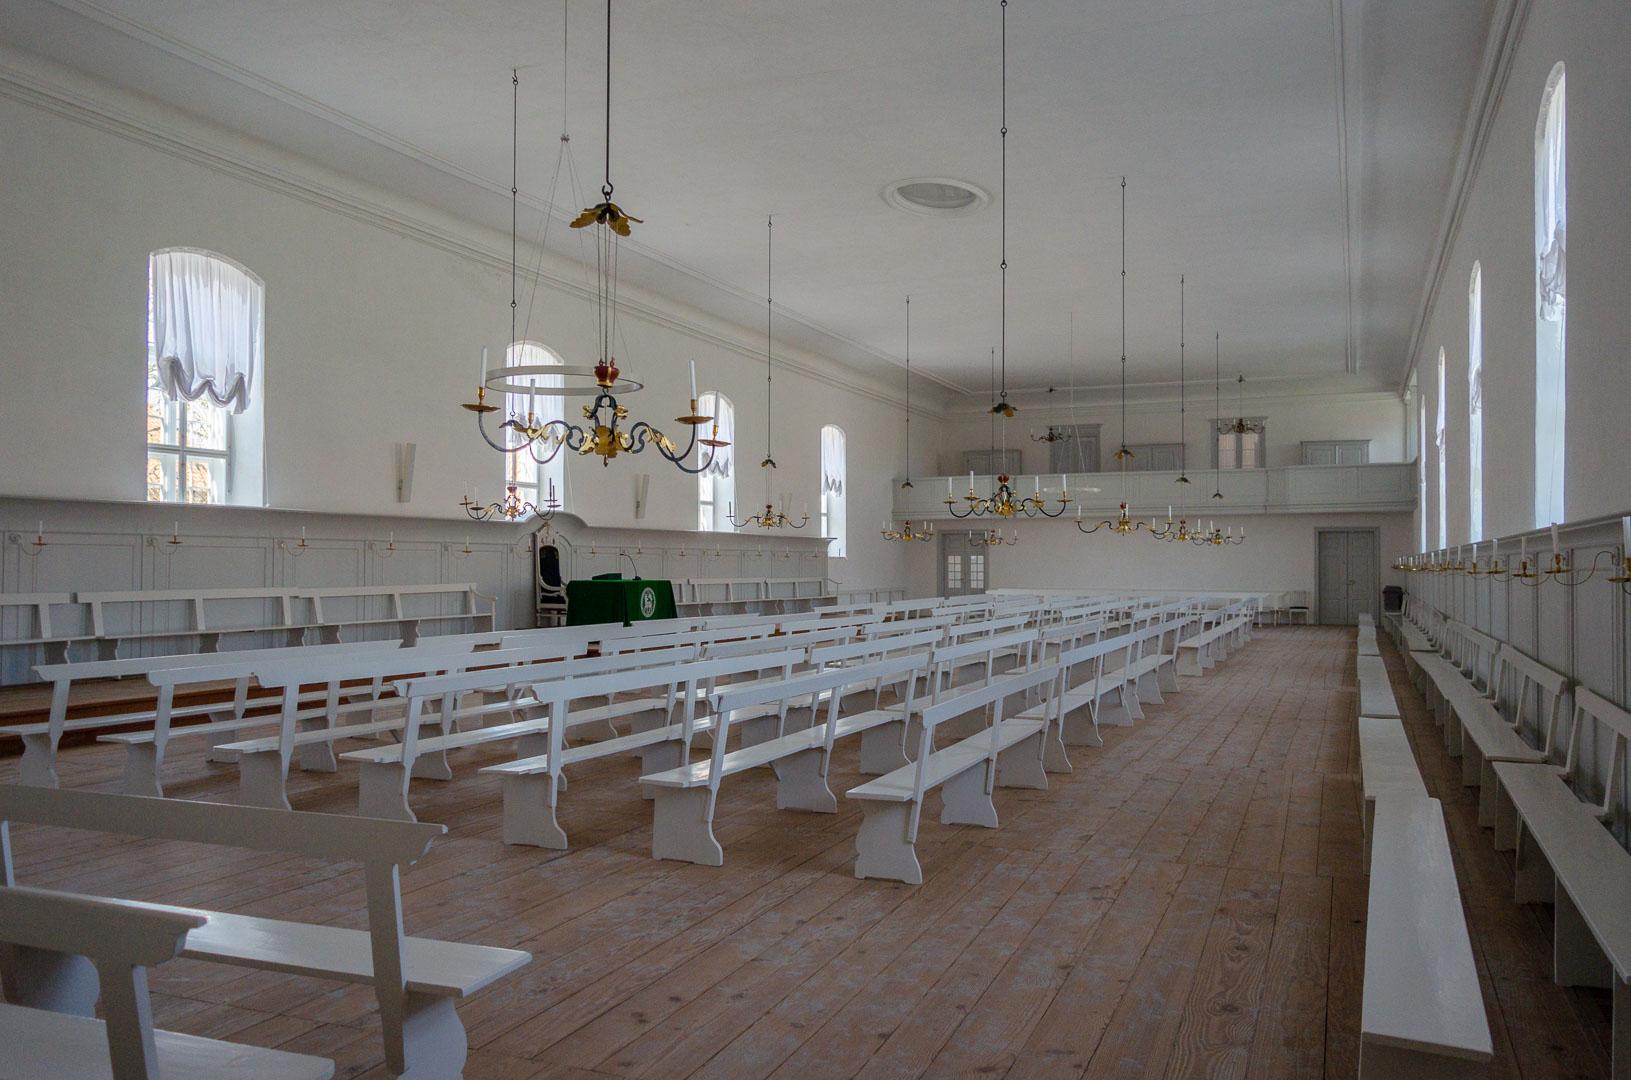 Innenraum der Kirche in Christiansfeld